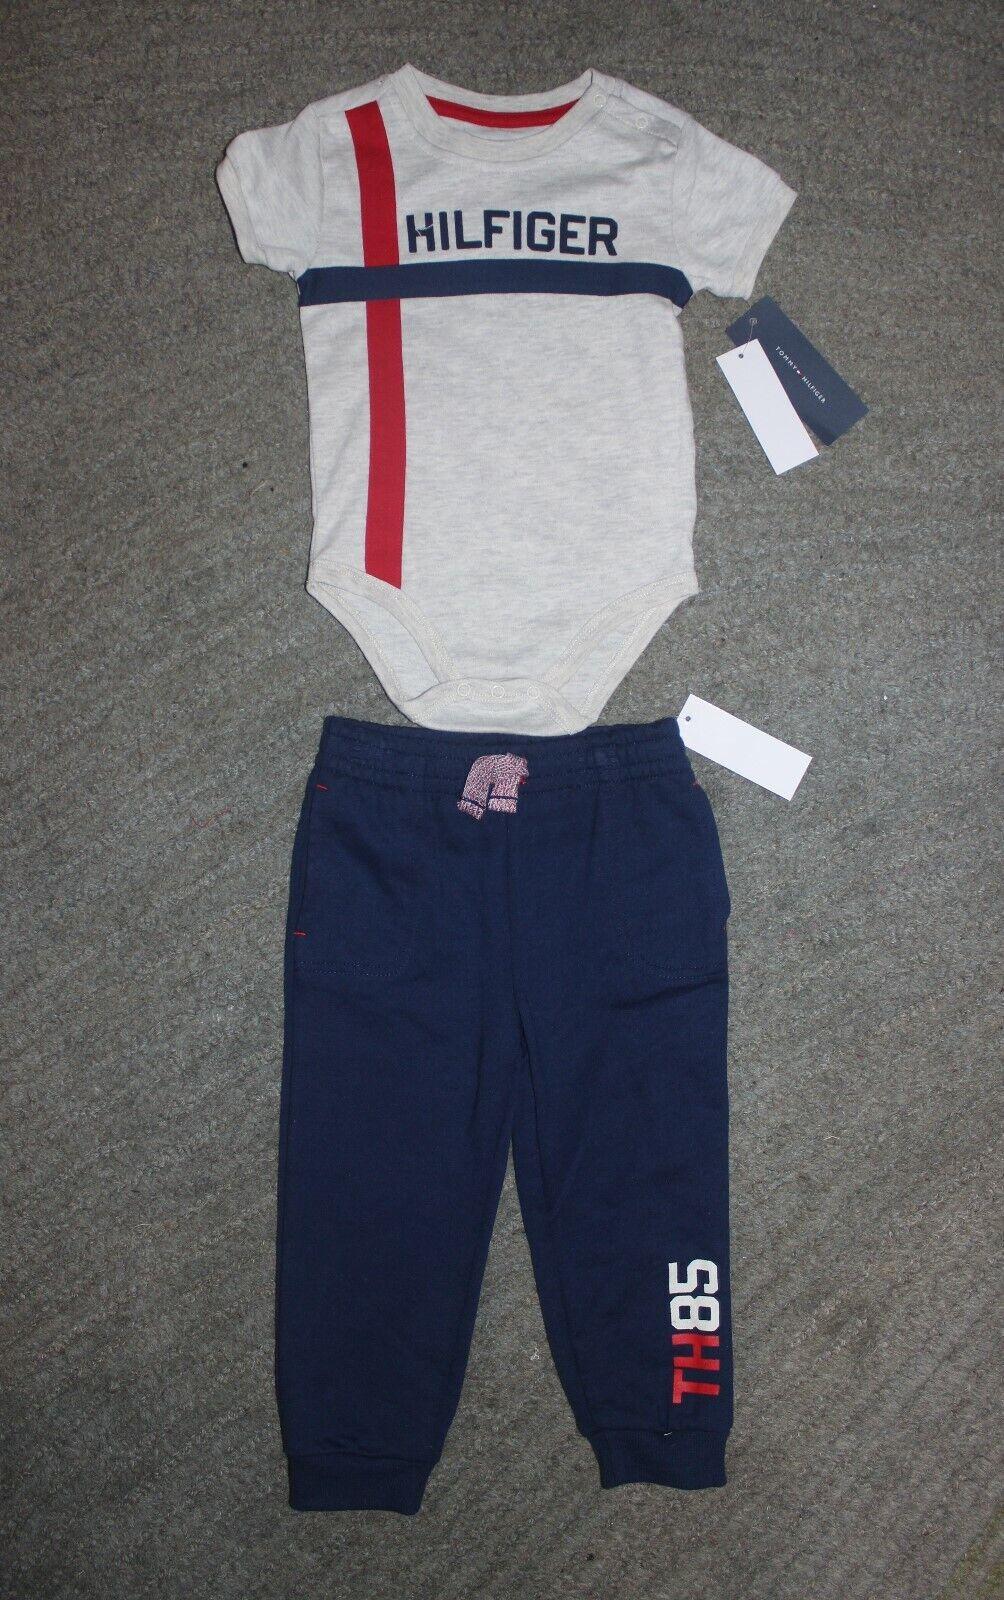 Tommy Hilfiger Baby Boys 2 Piece Set - Size 18 Months - NWT